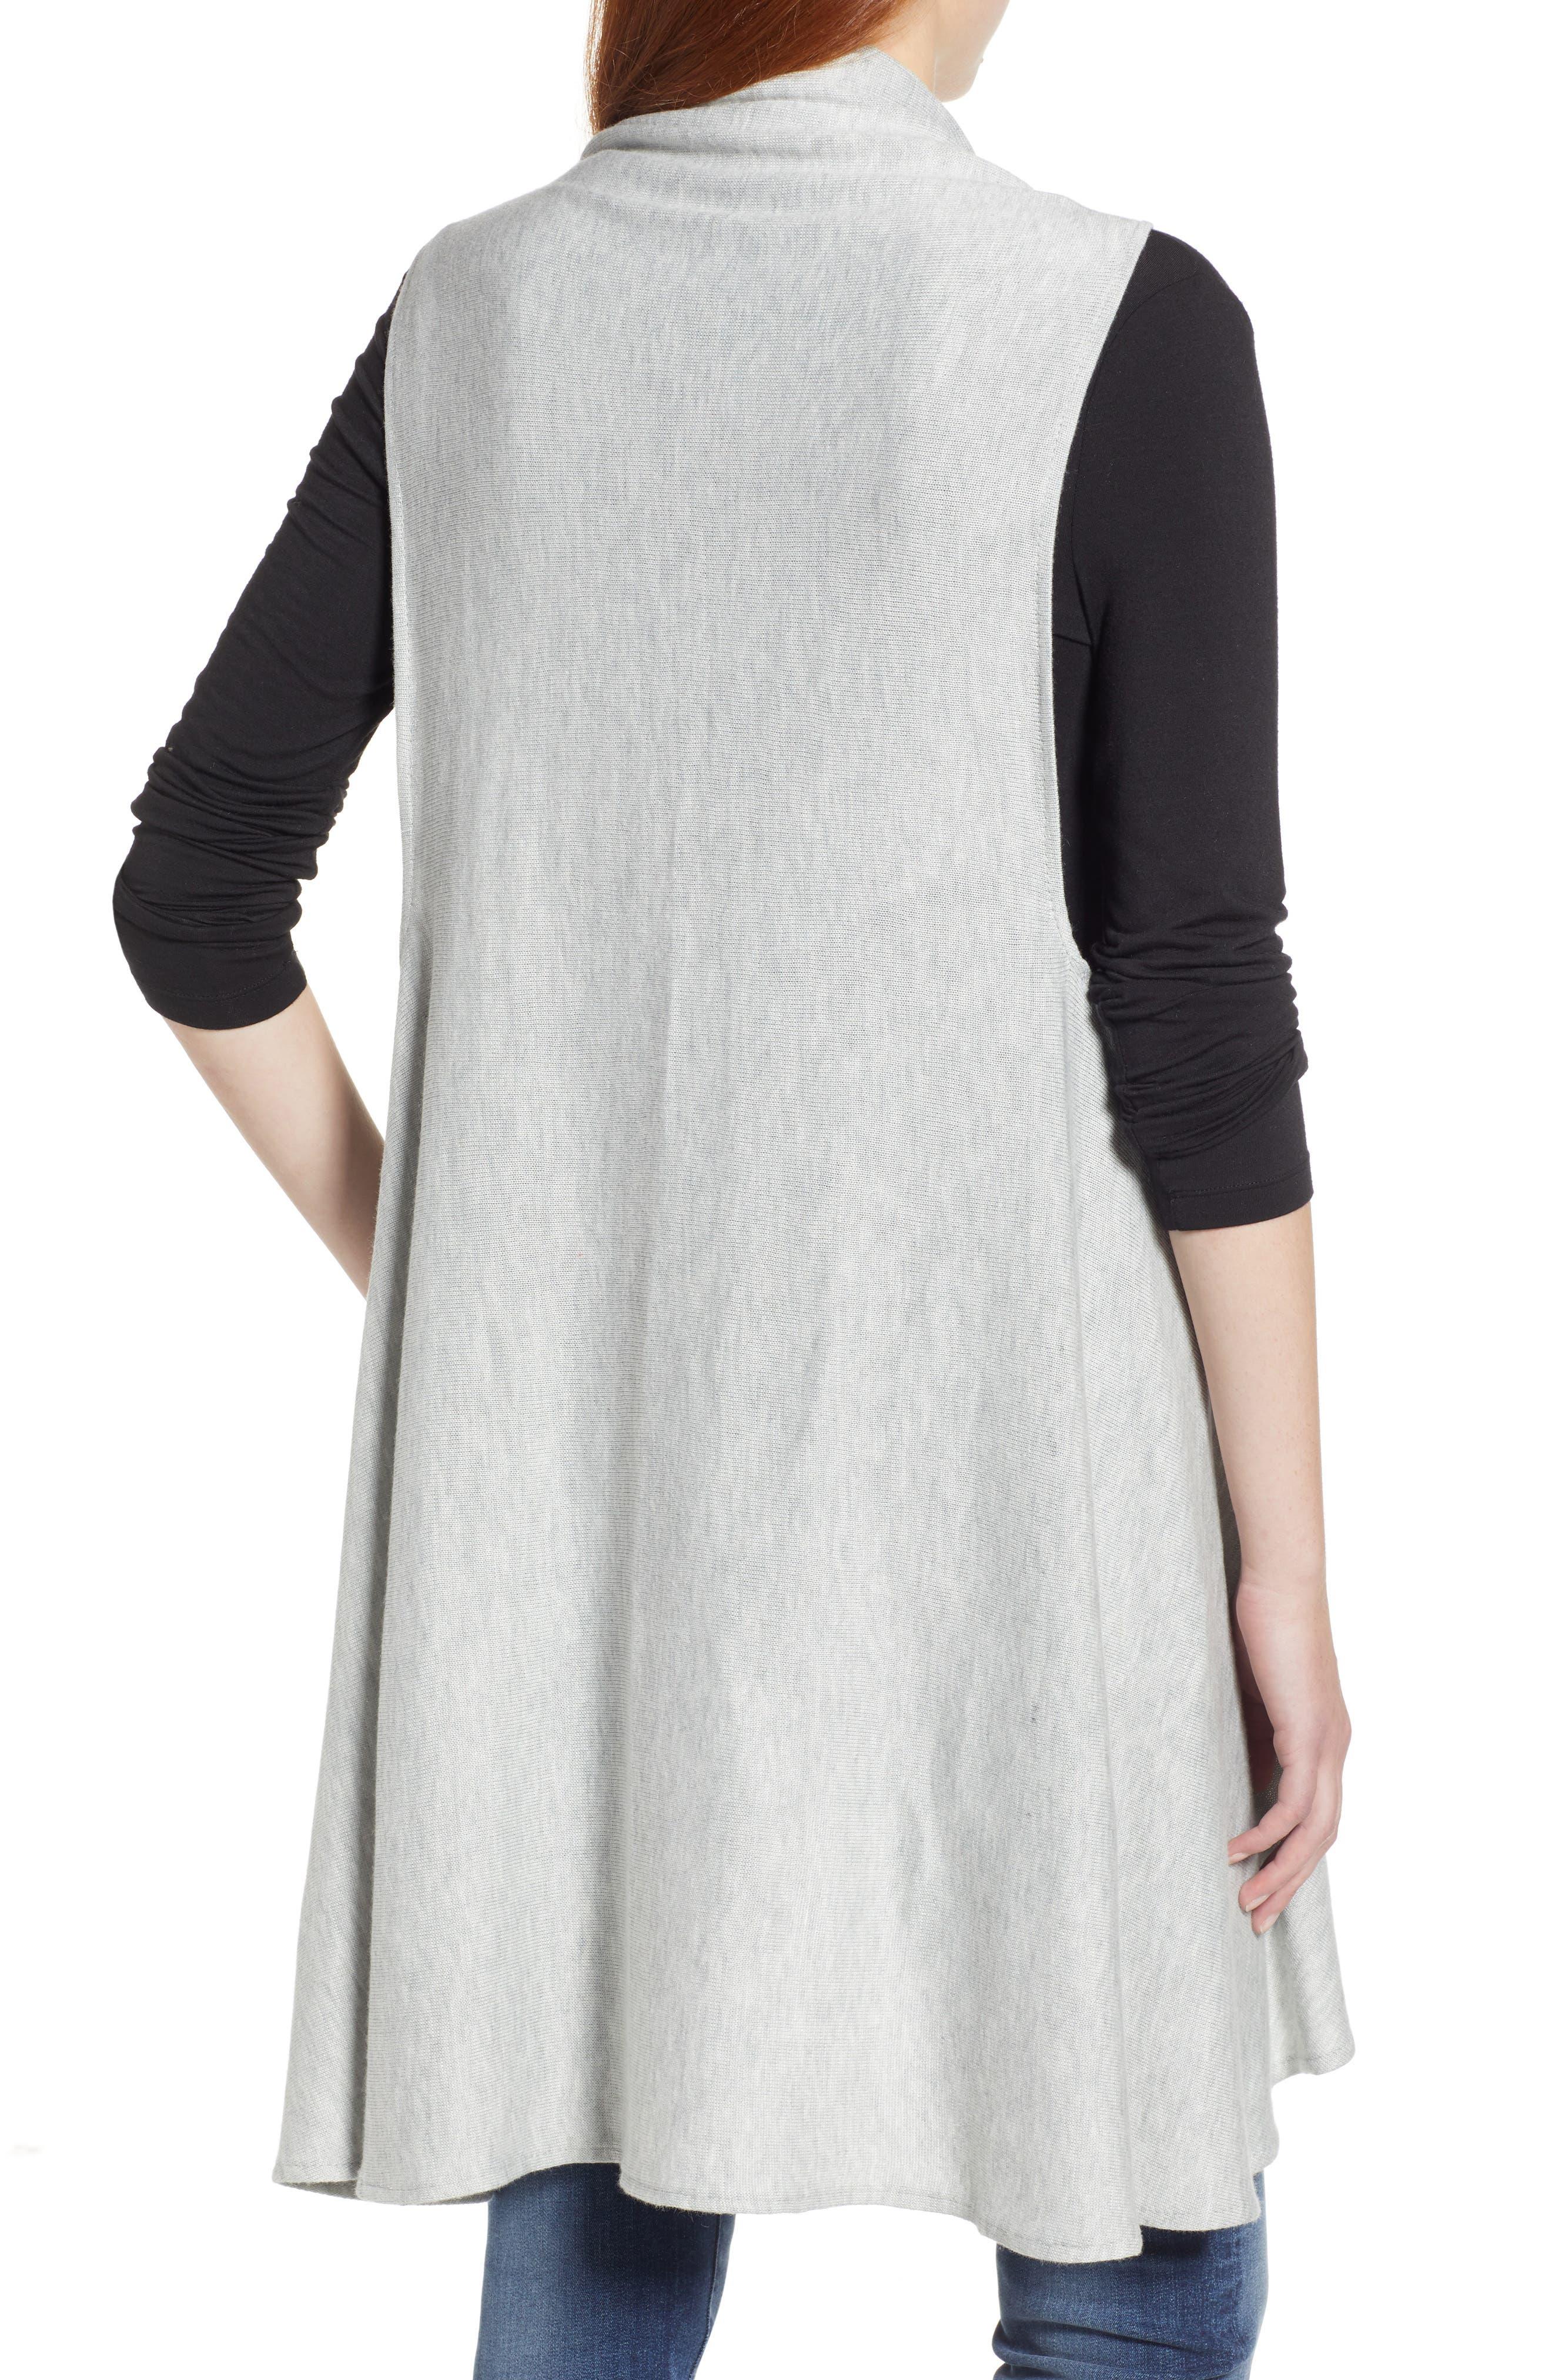 Essential Knit Vest,                             Alternate thumbnail 2, color,                             GREY SOFT HEATHER